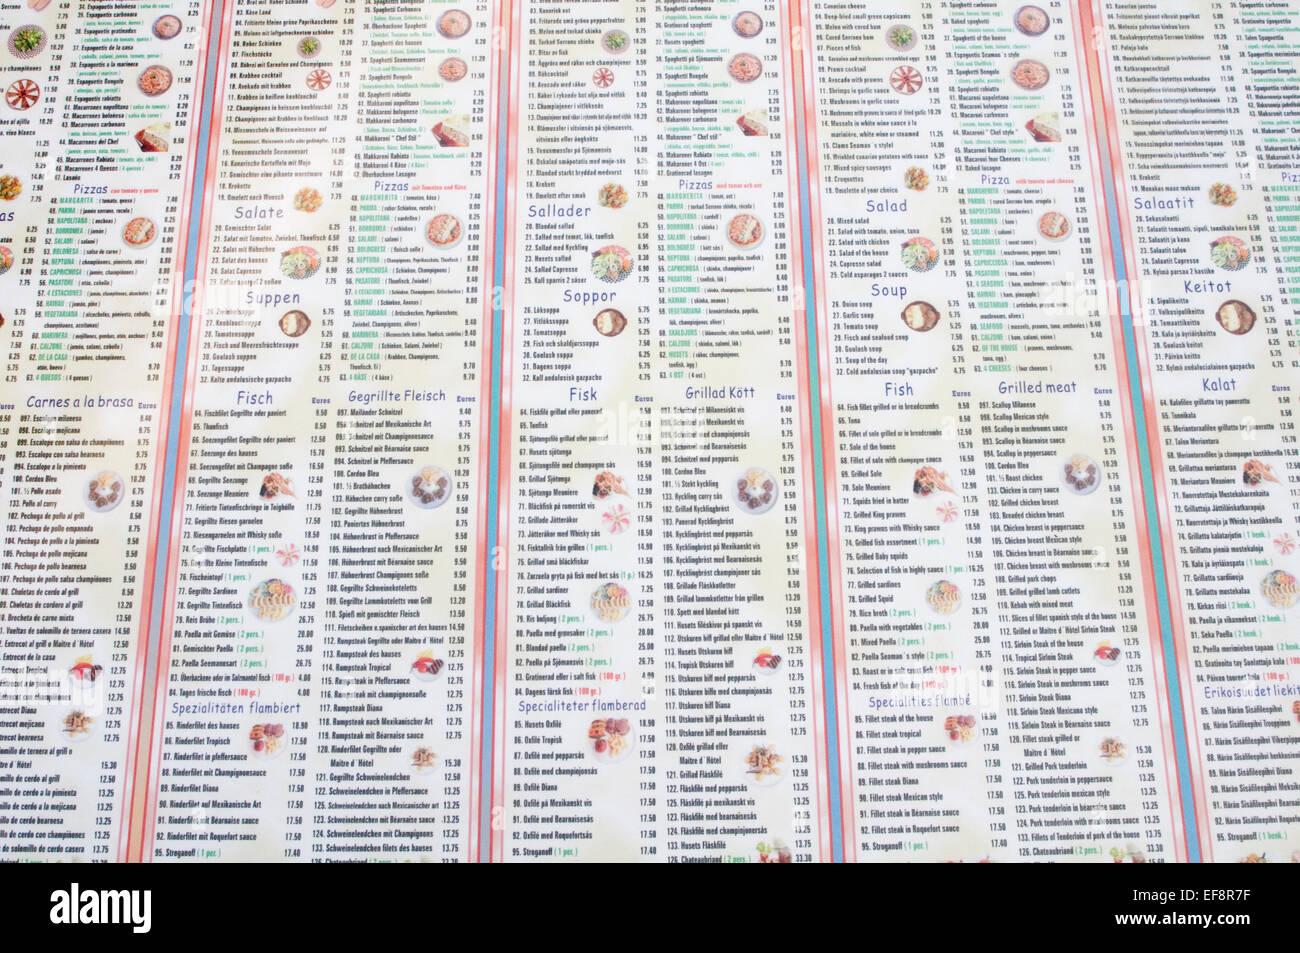 menu menus restaurant restaurants language languages multi lingual translation software translations - Stock Image